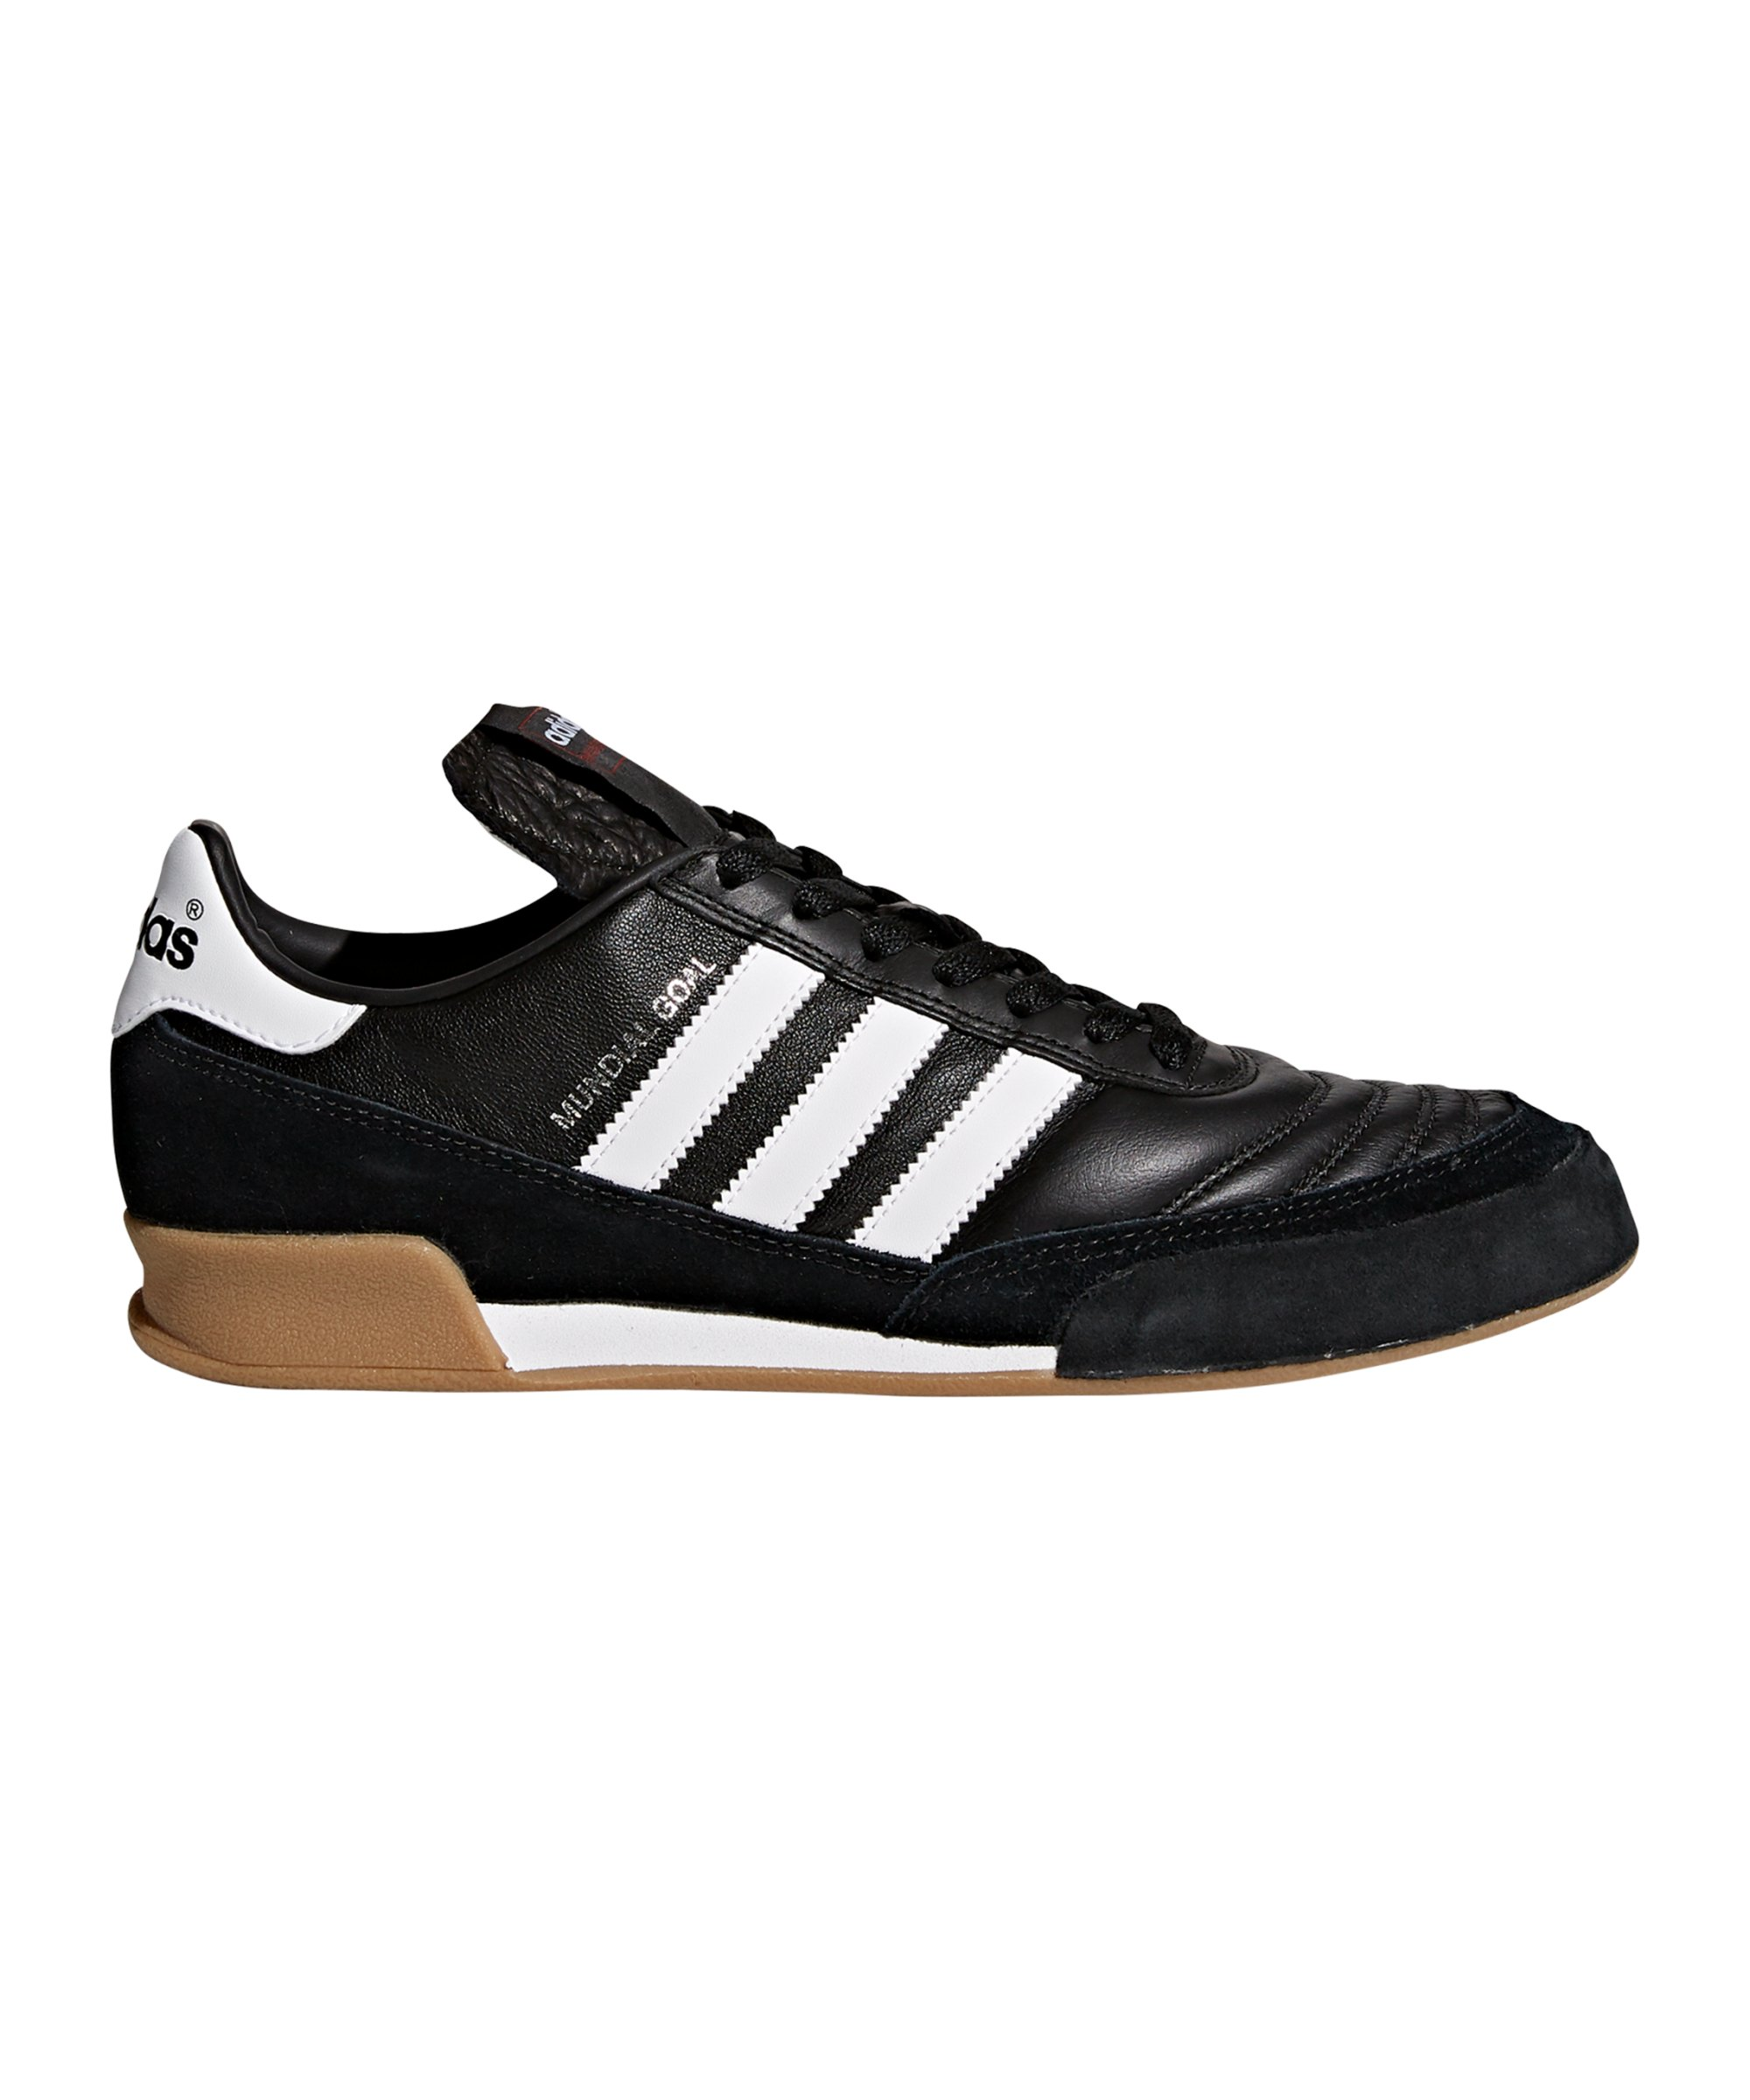 adidas_019310_big.jpg